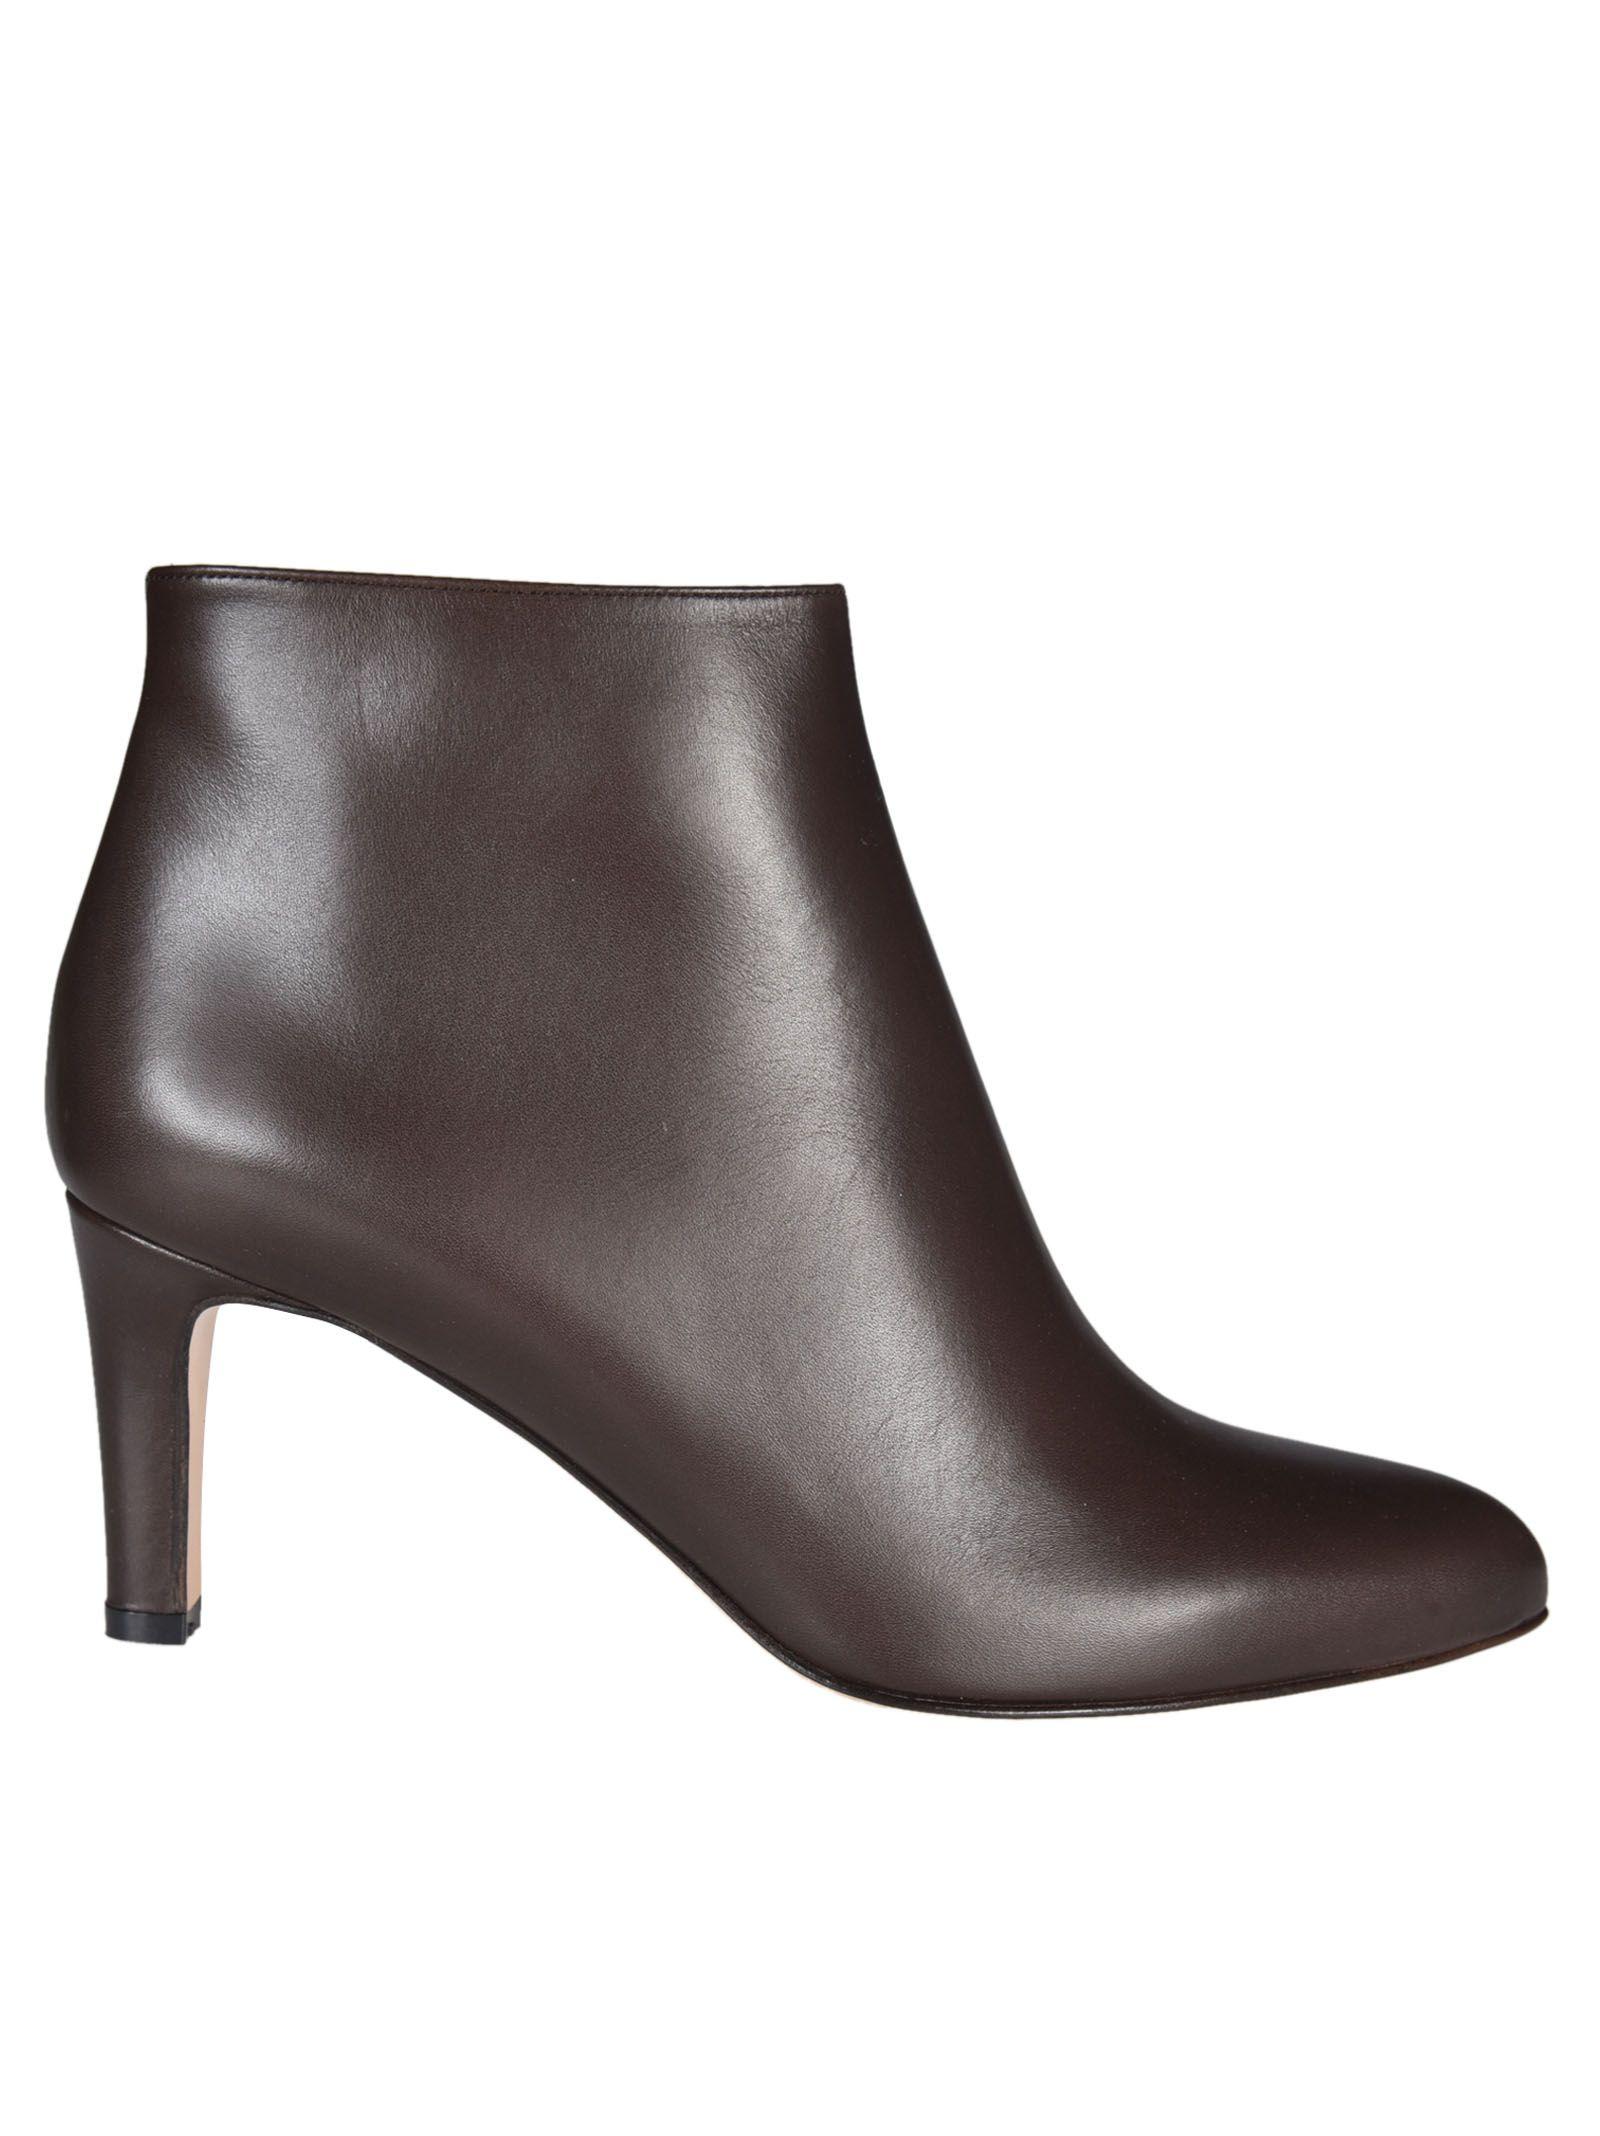 Antonio Barbato Pointed Ankle Boots